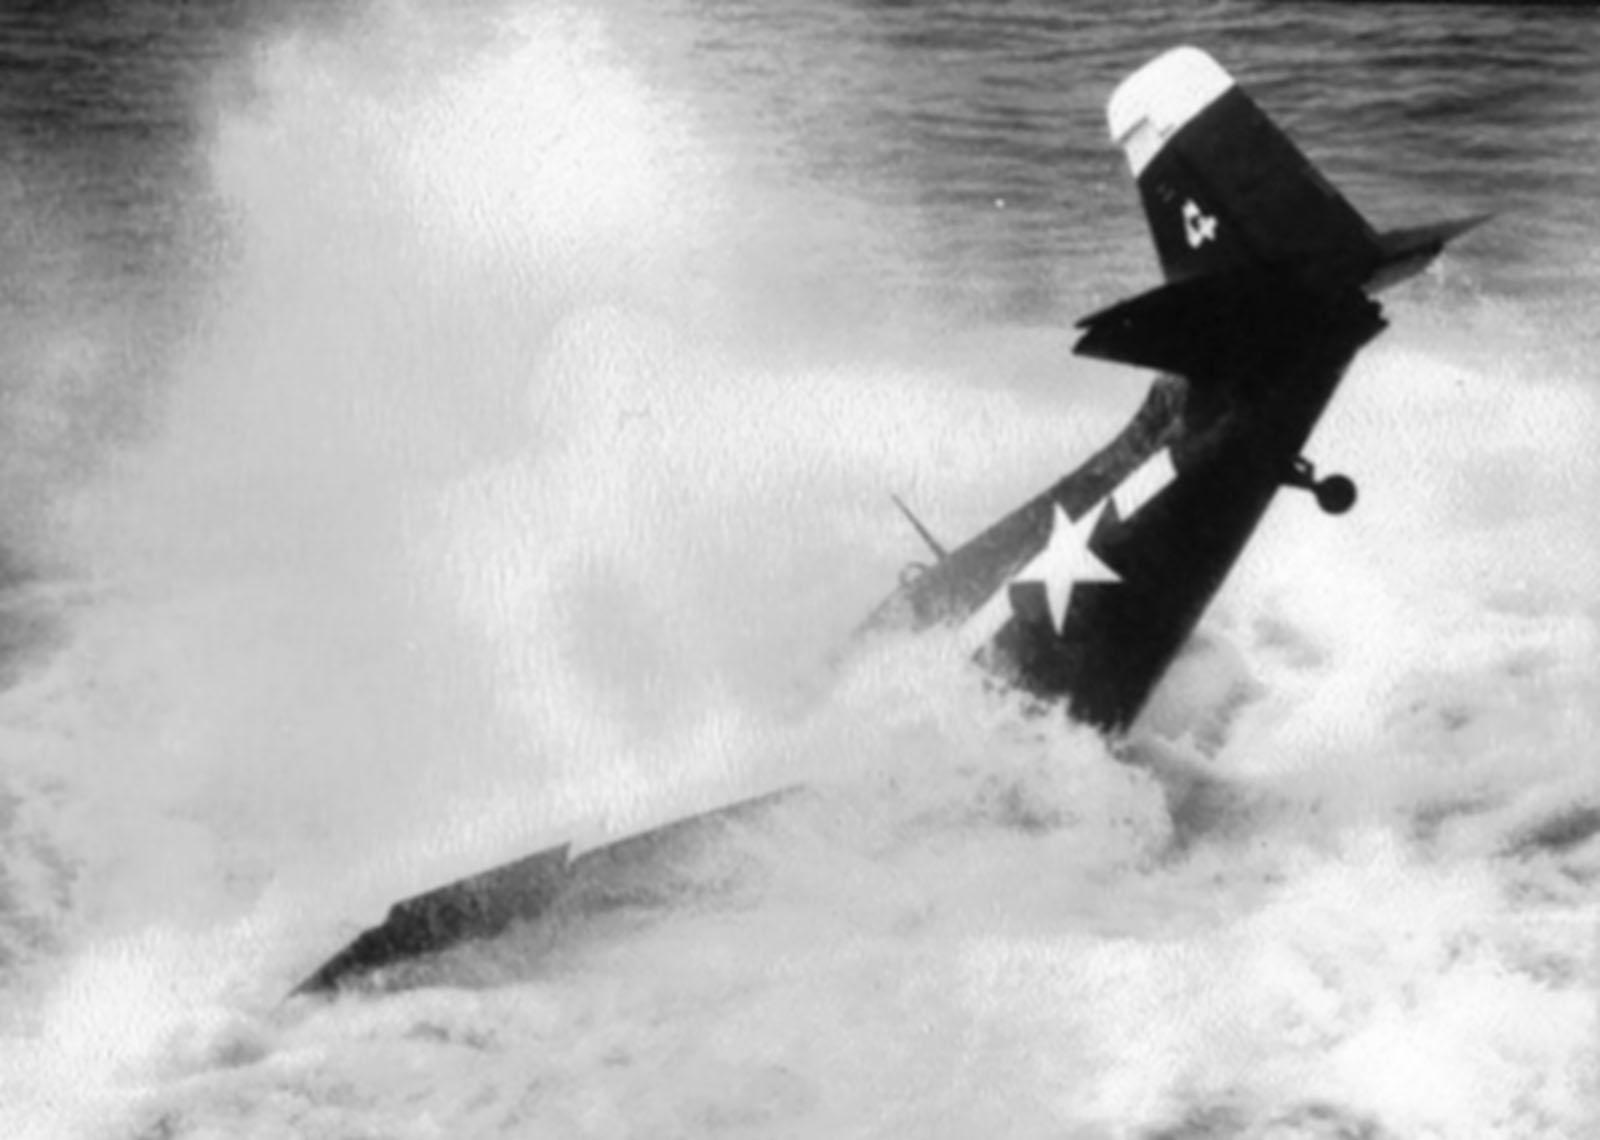 FM 2 Wildcat VC 81 White 4 landing mishap CVE 62 USS Natoma Bay 1944 01